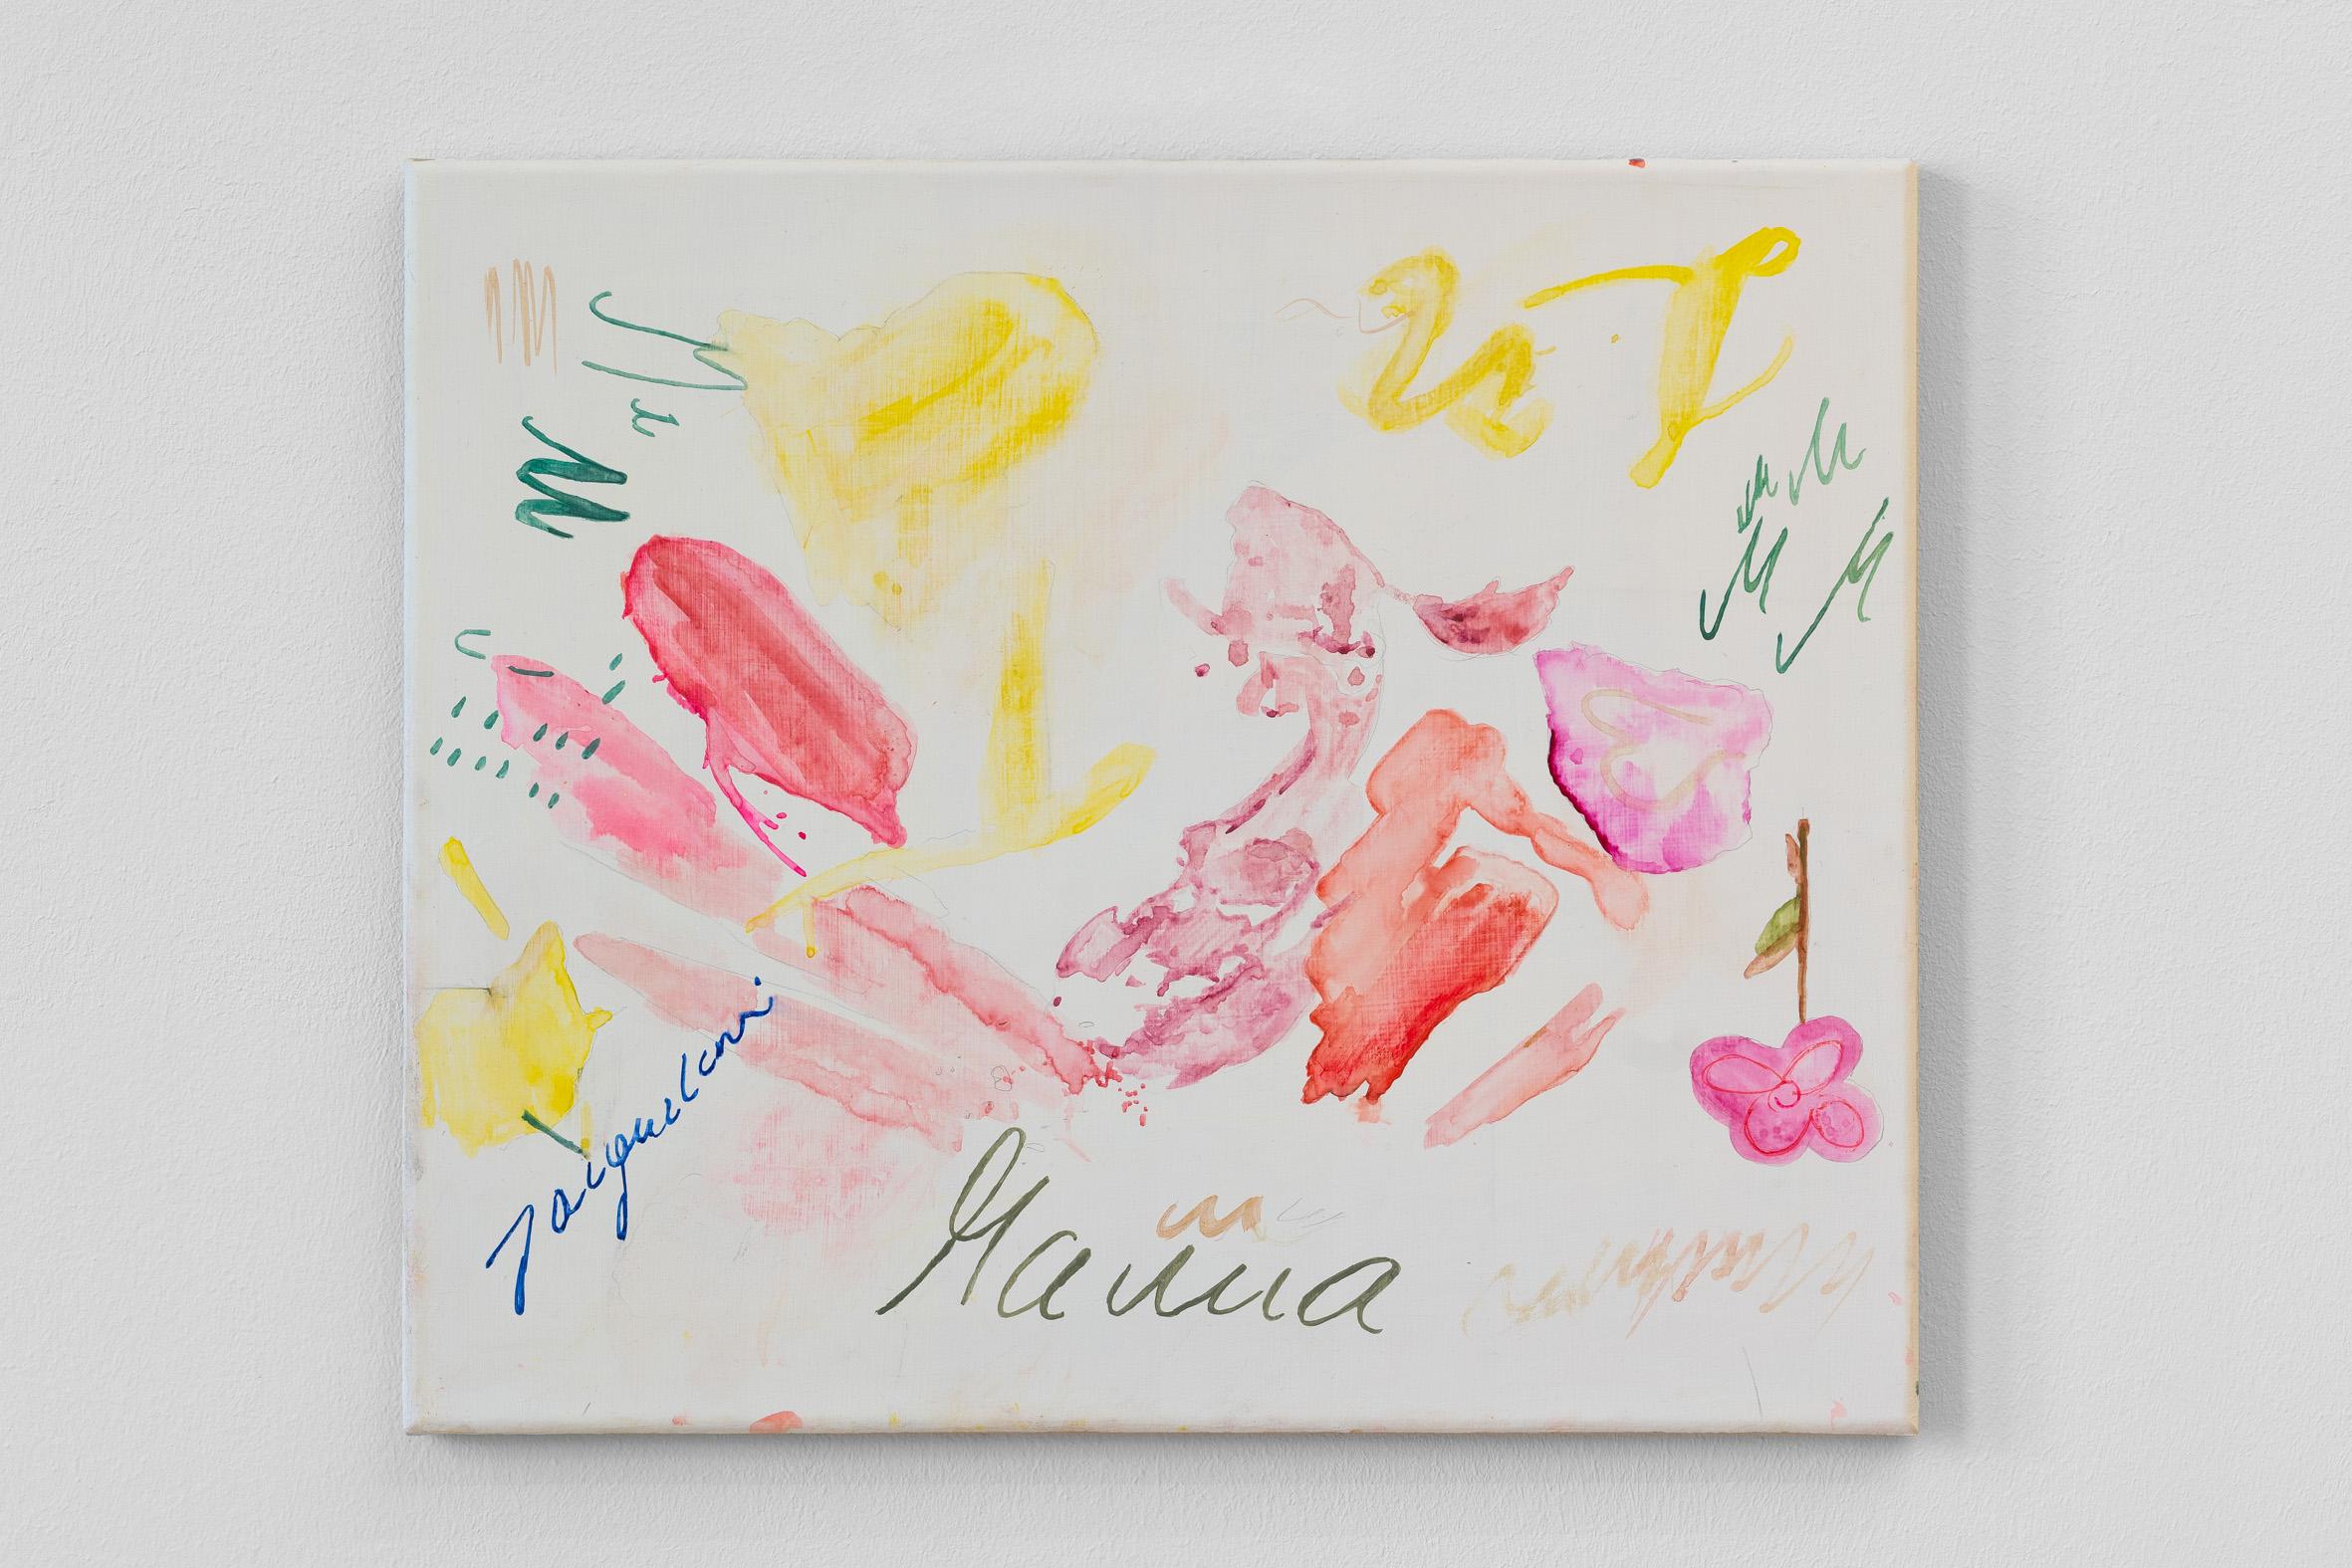 Sofia Leiby,  Jacqueline (Creative World I) , 2019 Watercolor and pencil on linen 42.5 x 50 cm